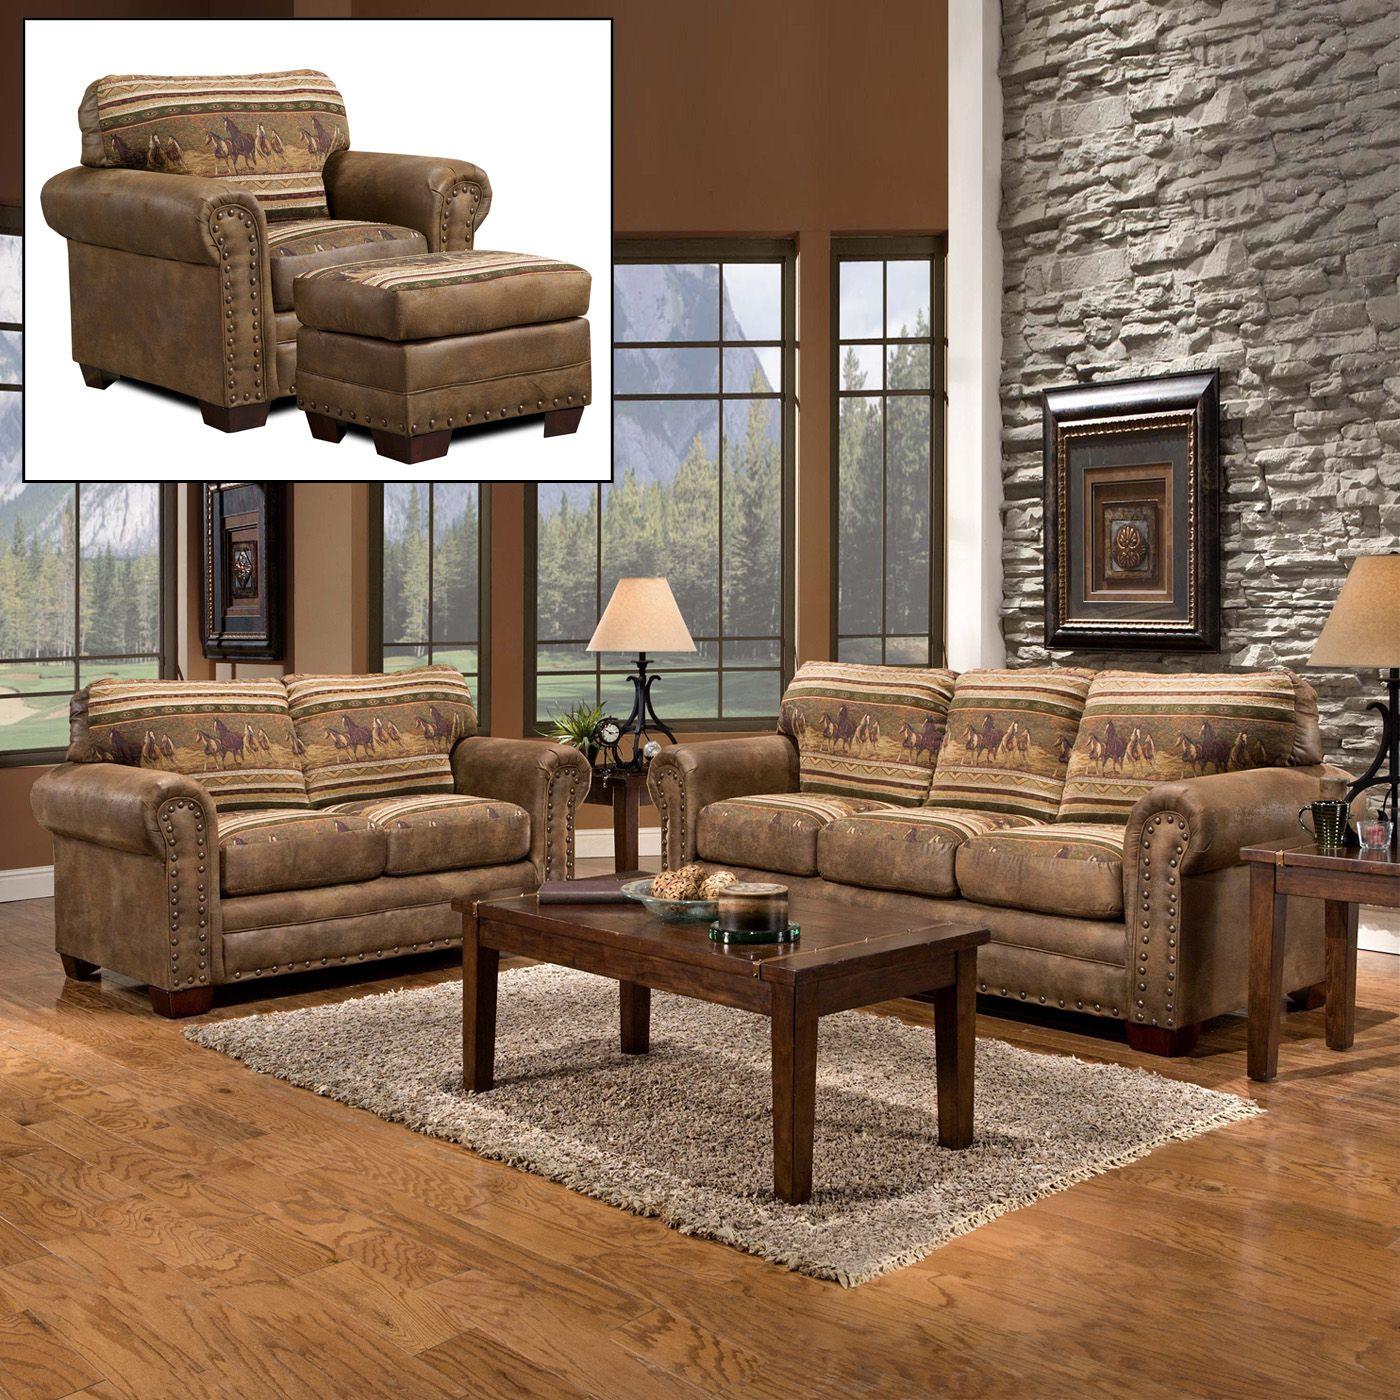 Ordinaire Shop American Furniture Classics American Furniture 8500 40K Wild Horses  Sofa Set At ATG Stores